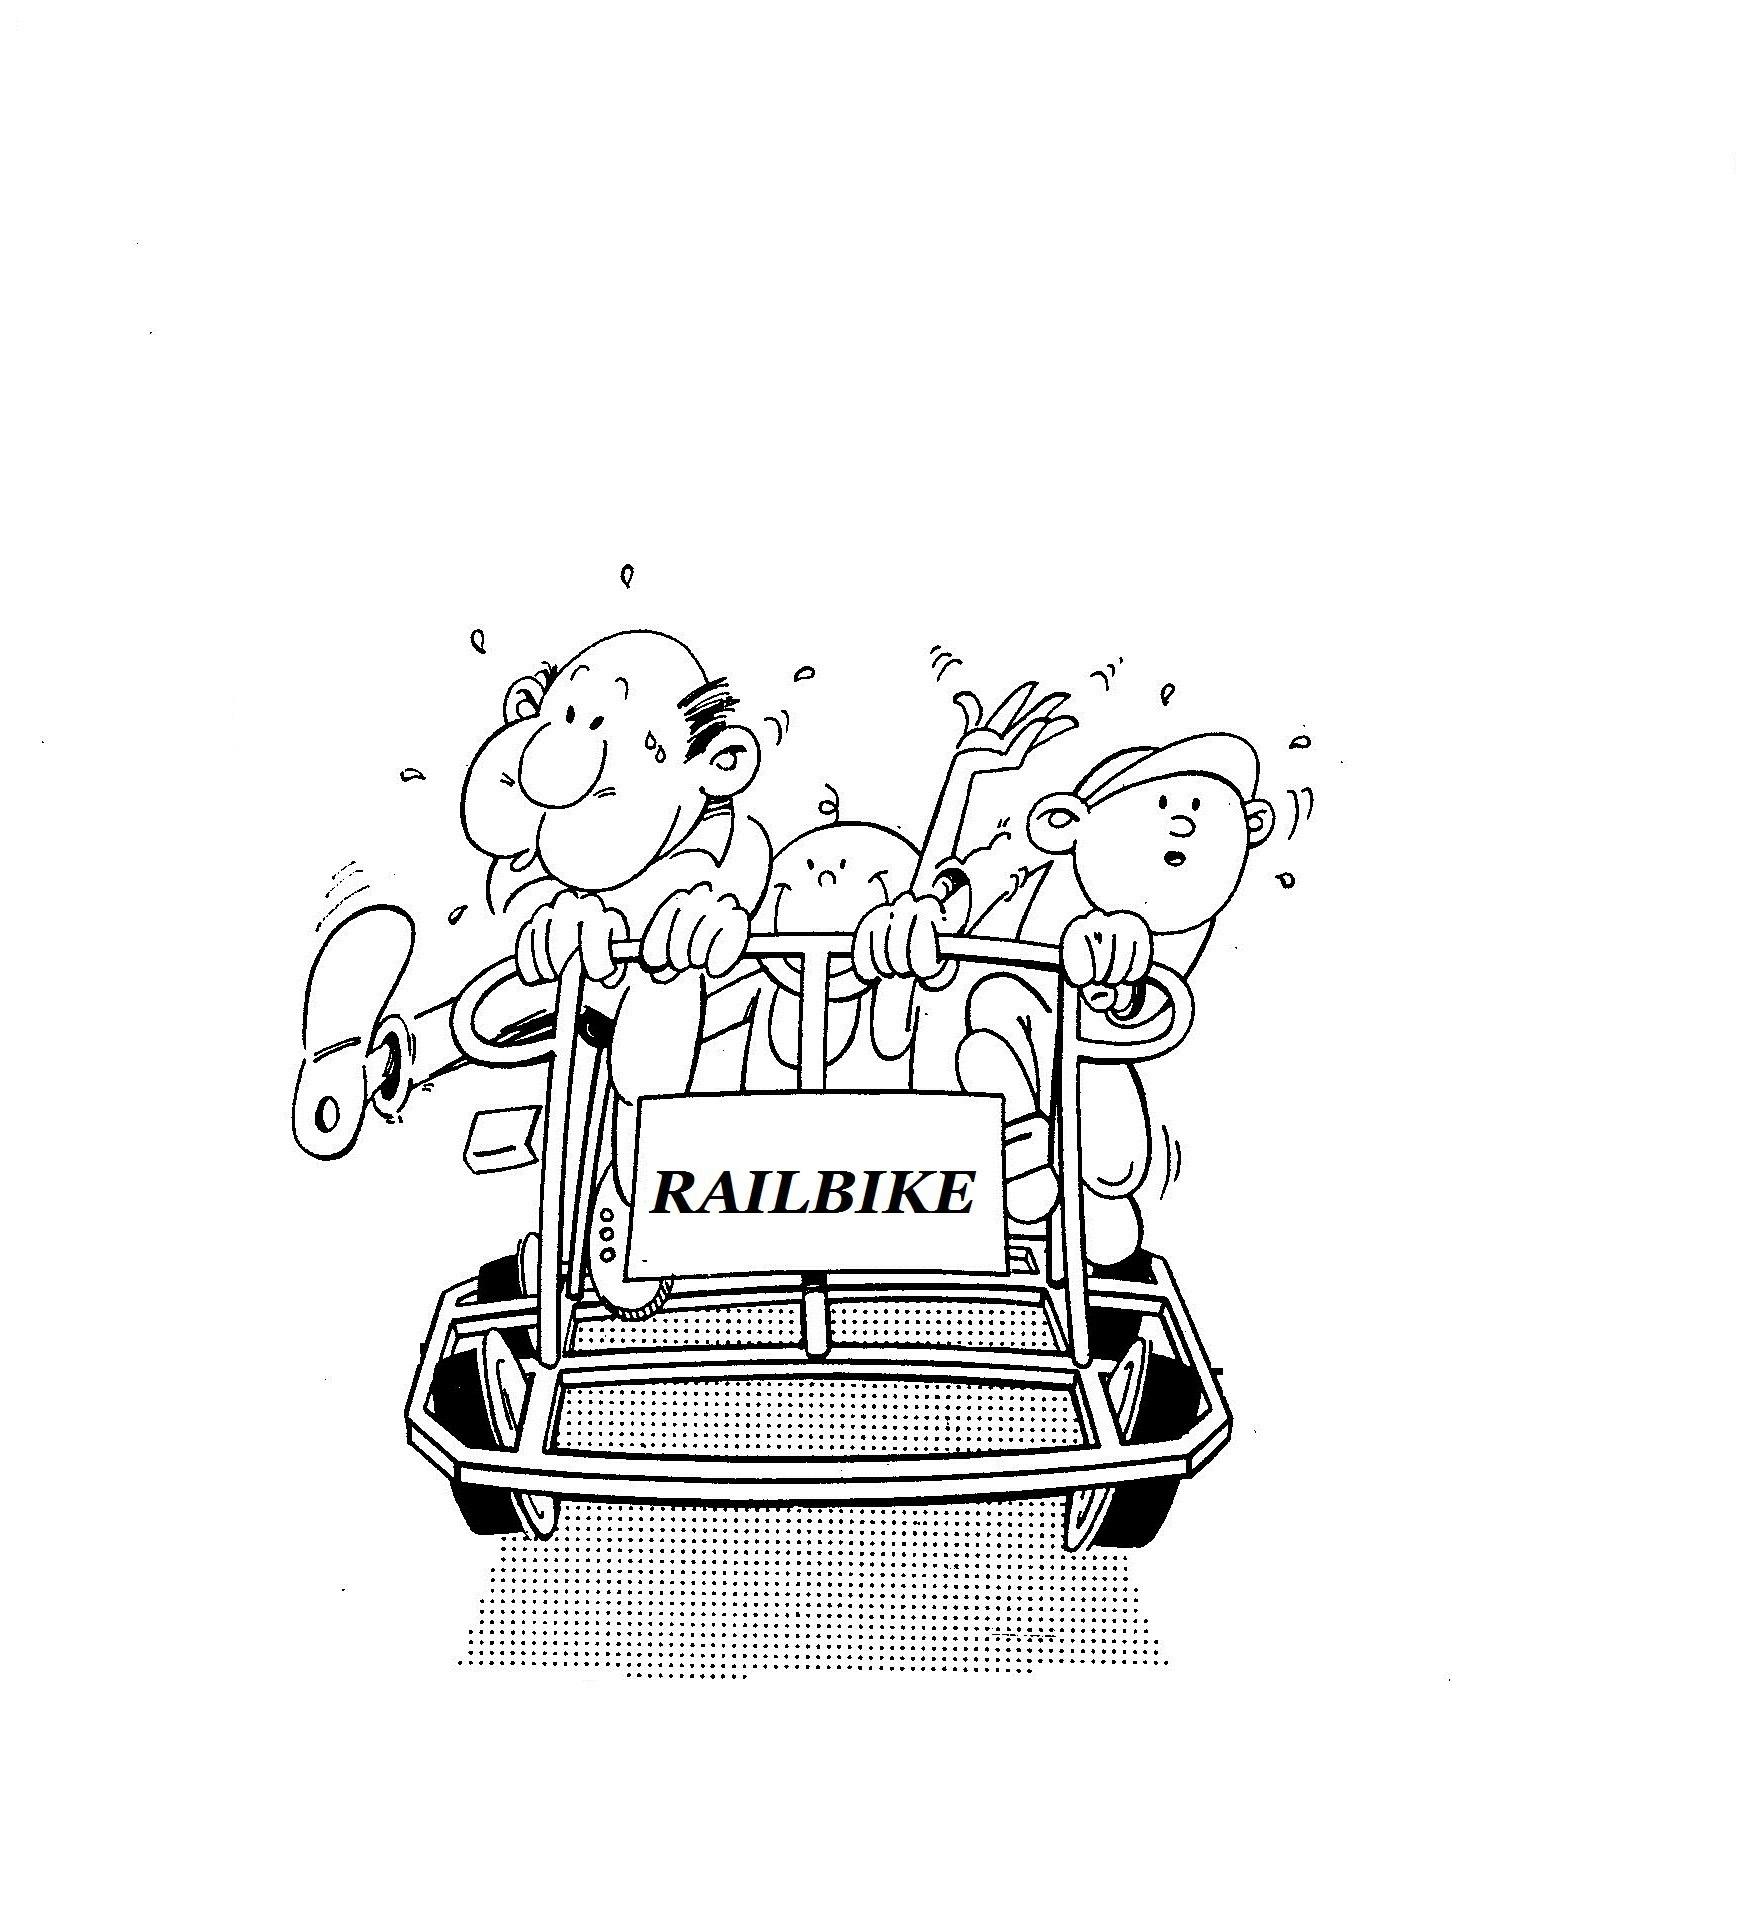 Railbikes